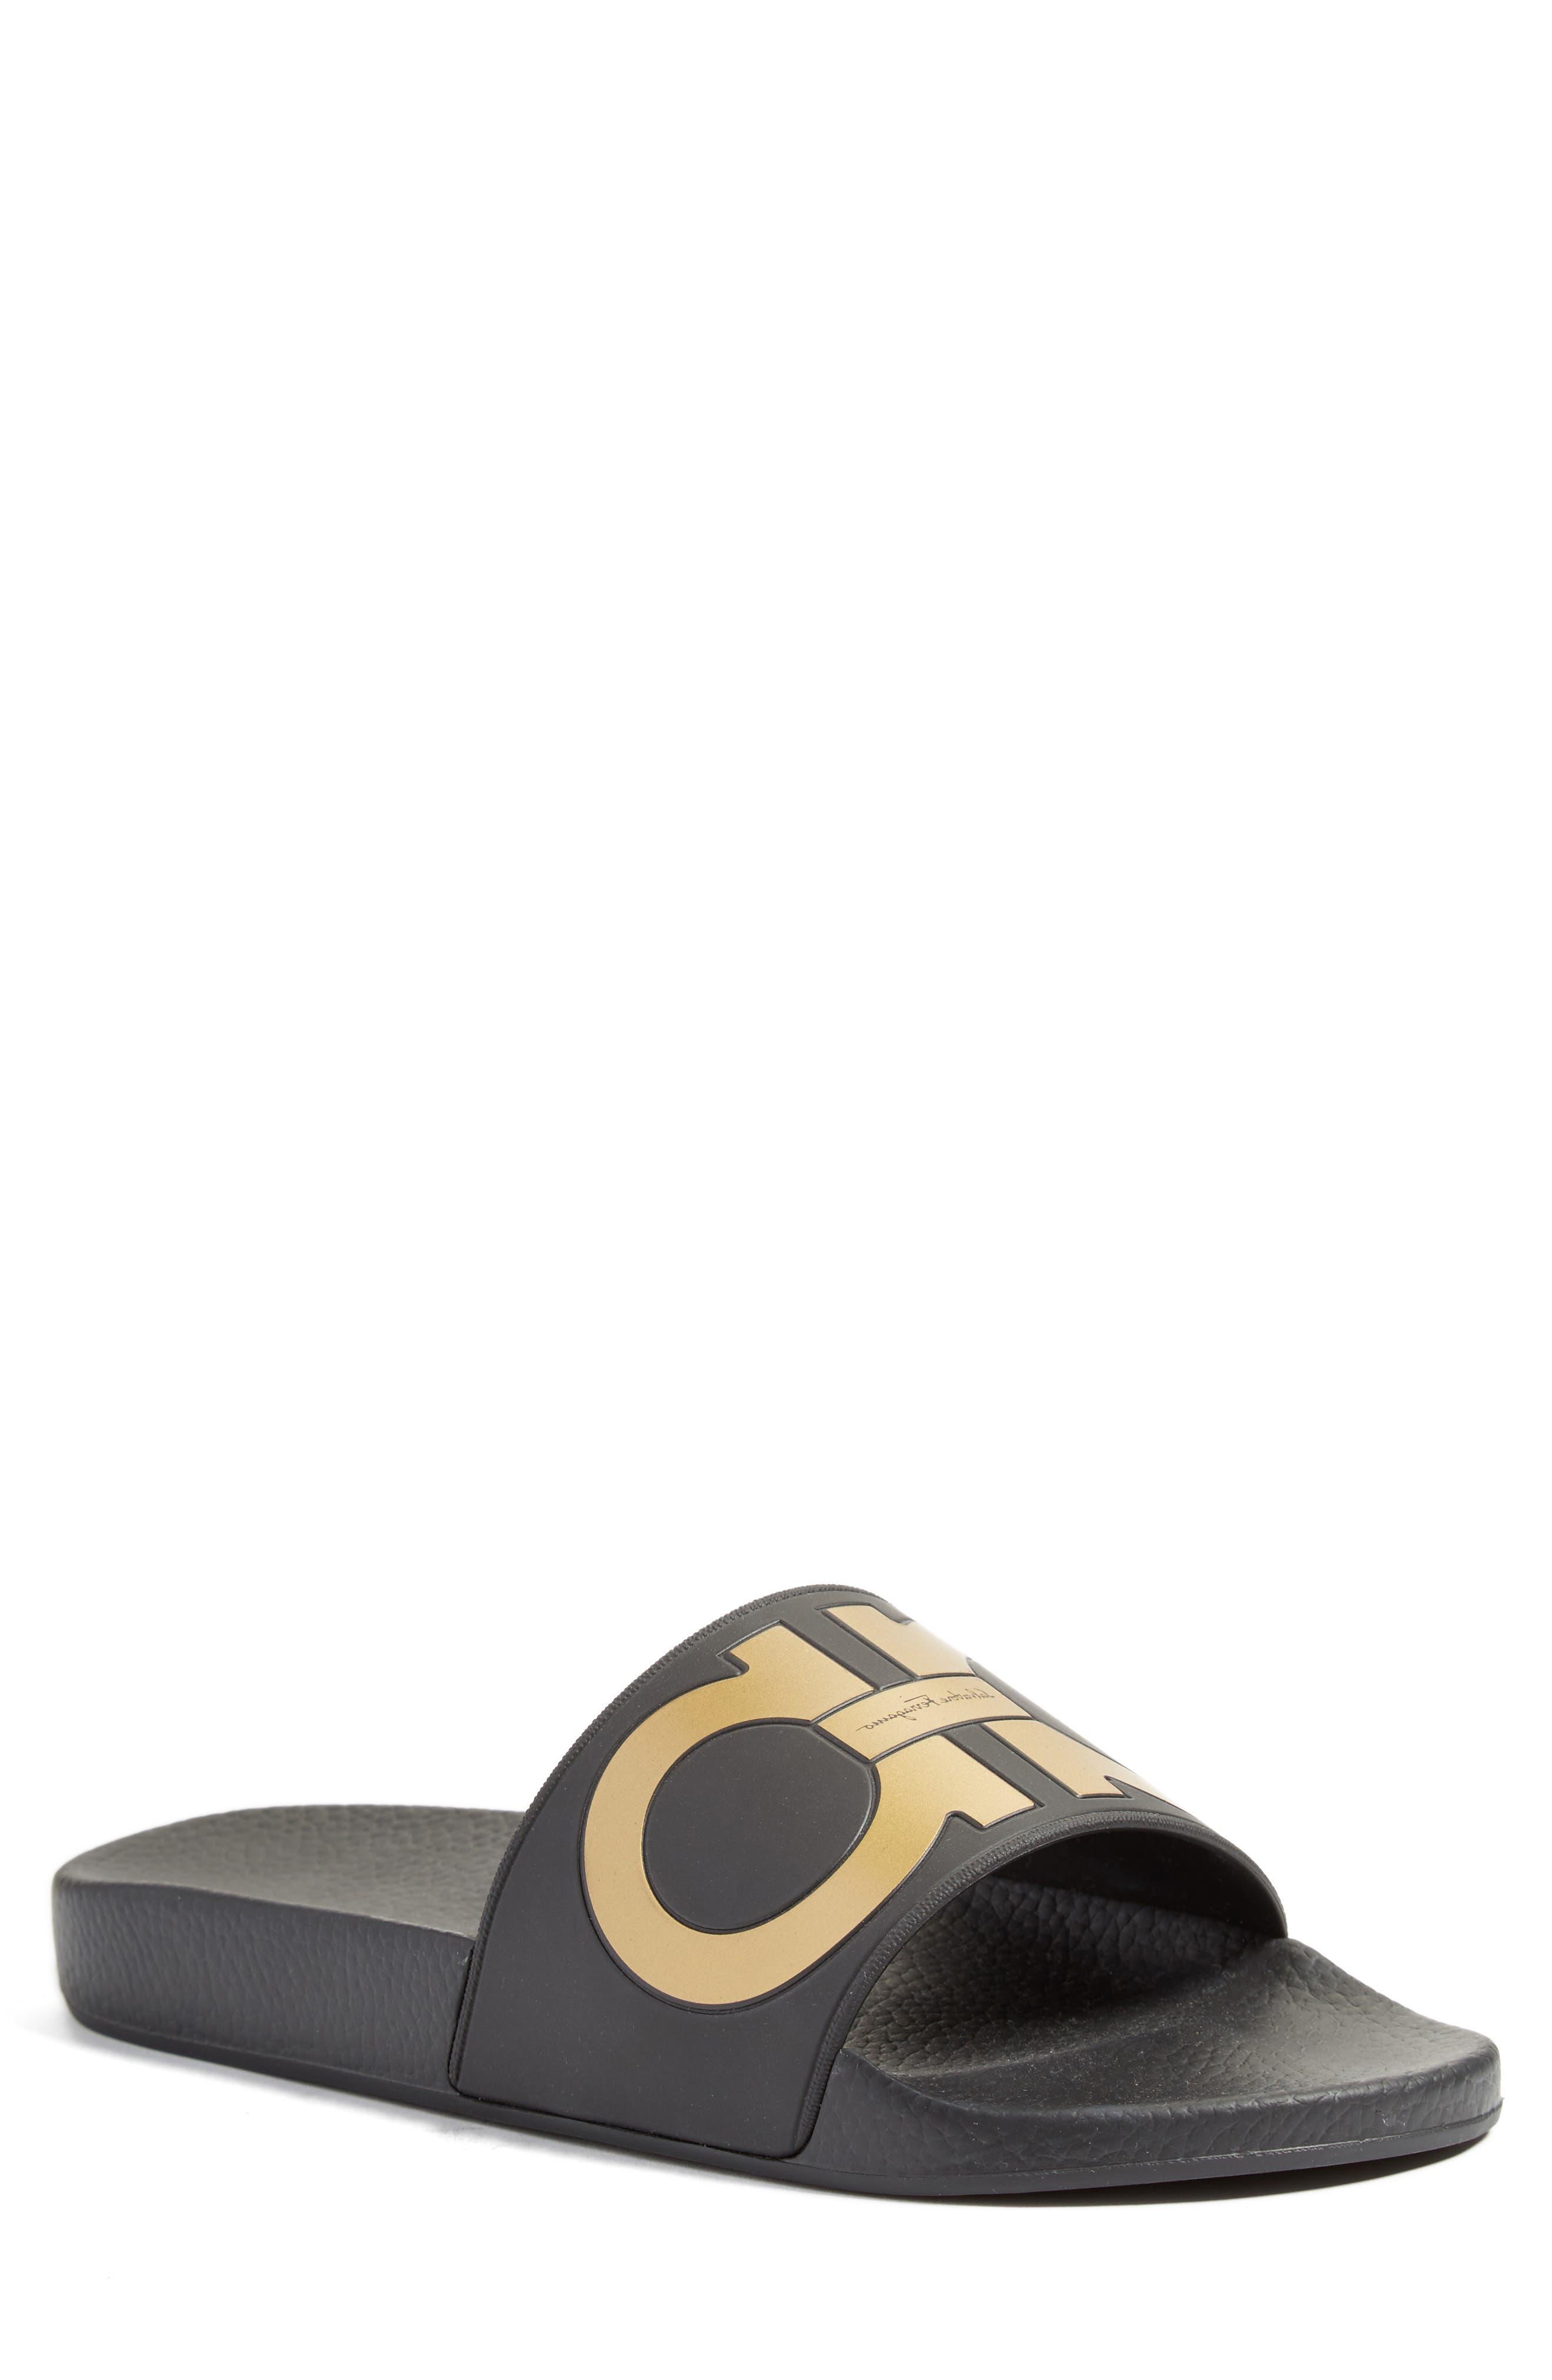 Groove Slide Sandal,                         Main,                         color, Nero